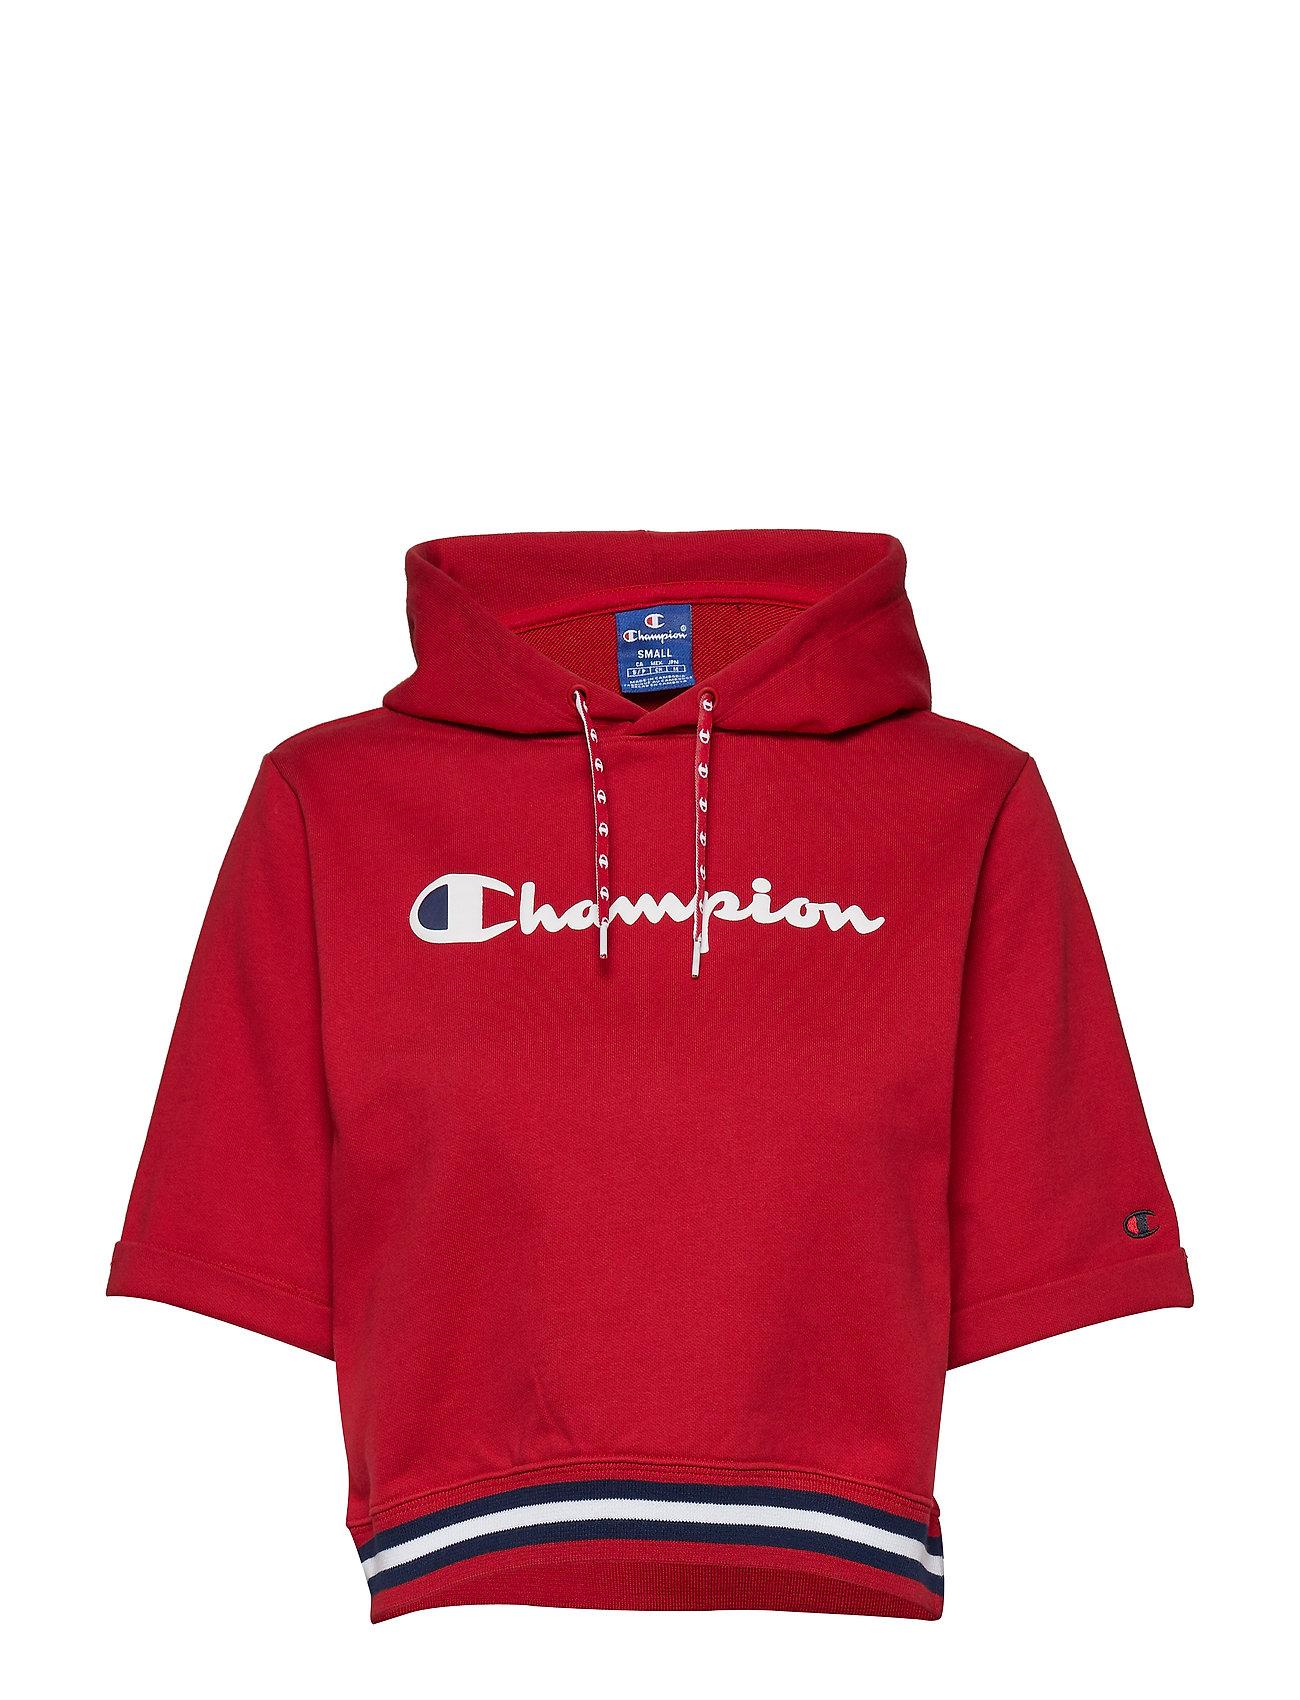 Champion Rochester Short Sleeve Hooded Sweatshirt